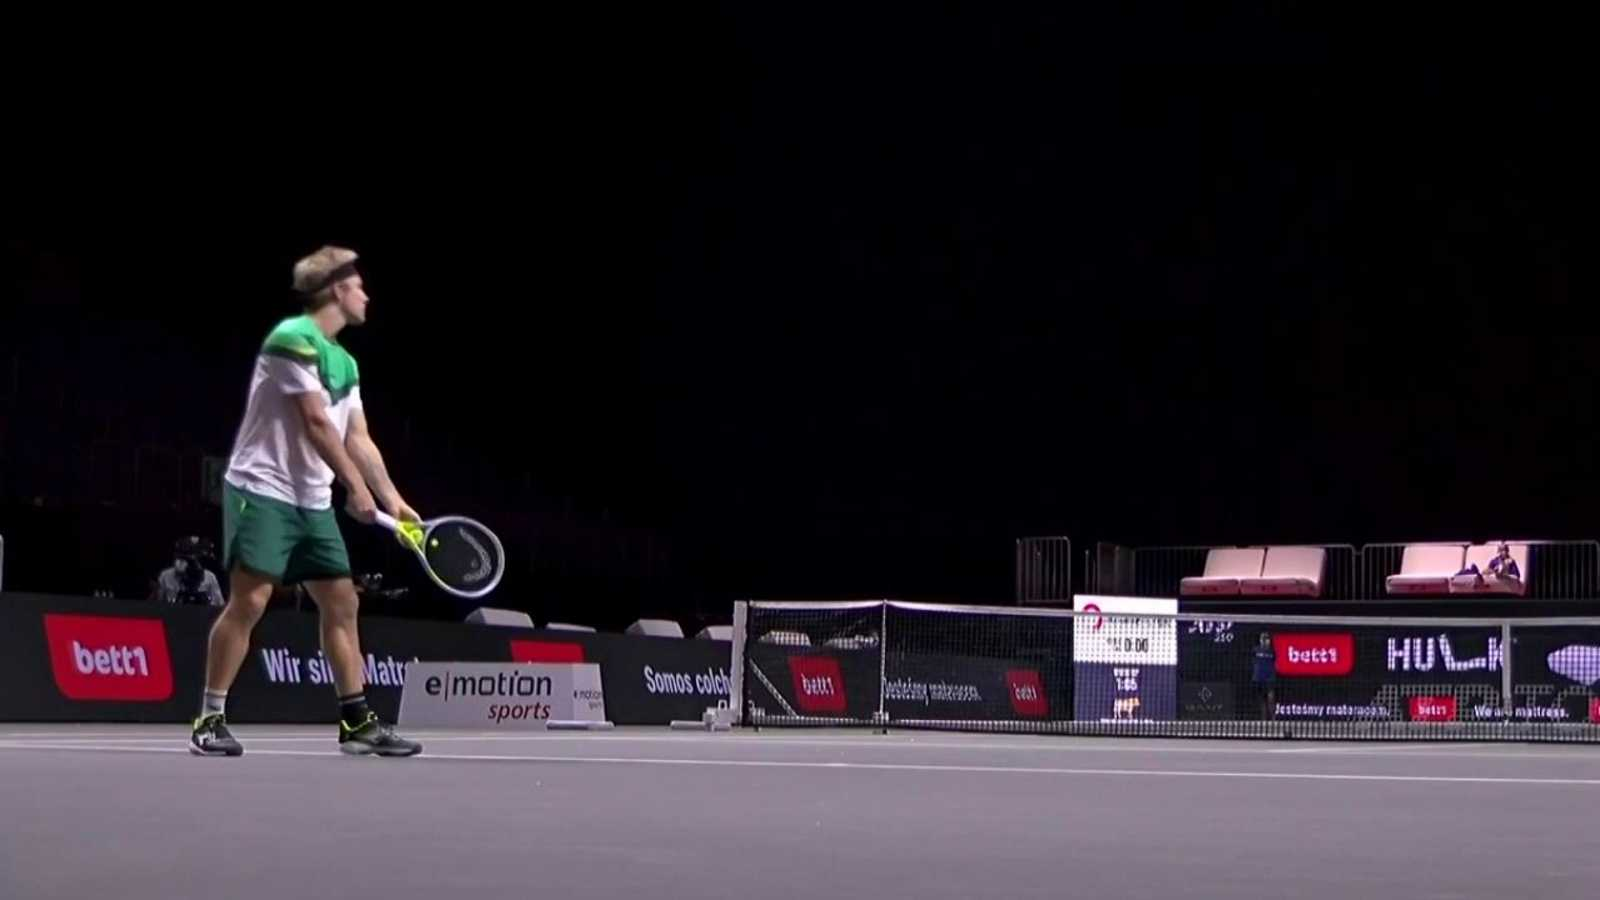 Tenis - ATP 250 Torneo Colonia (II): Steve Johnson - Alejandro Davidovich Fokina - ver ahora